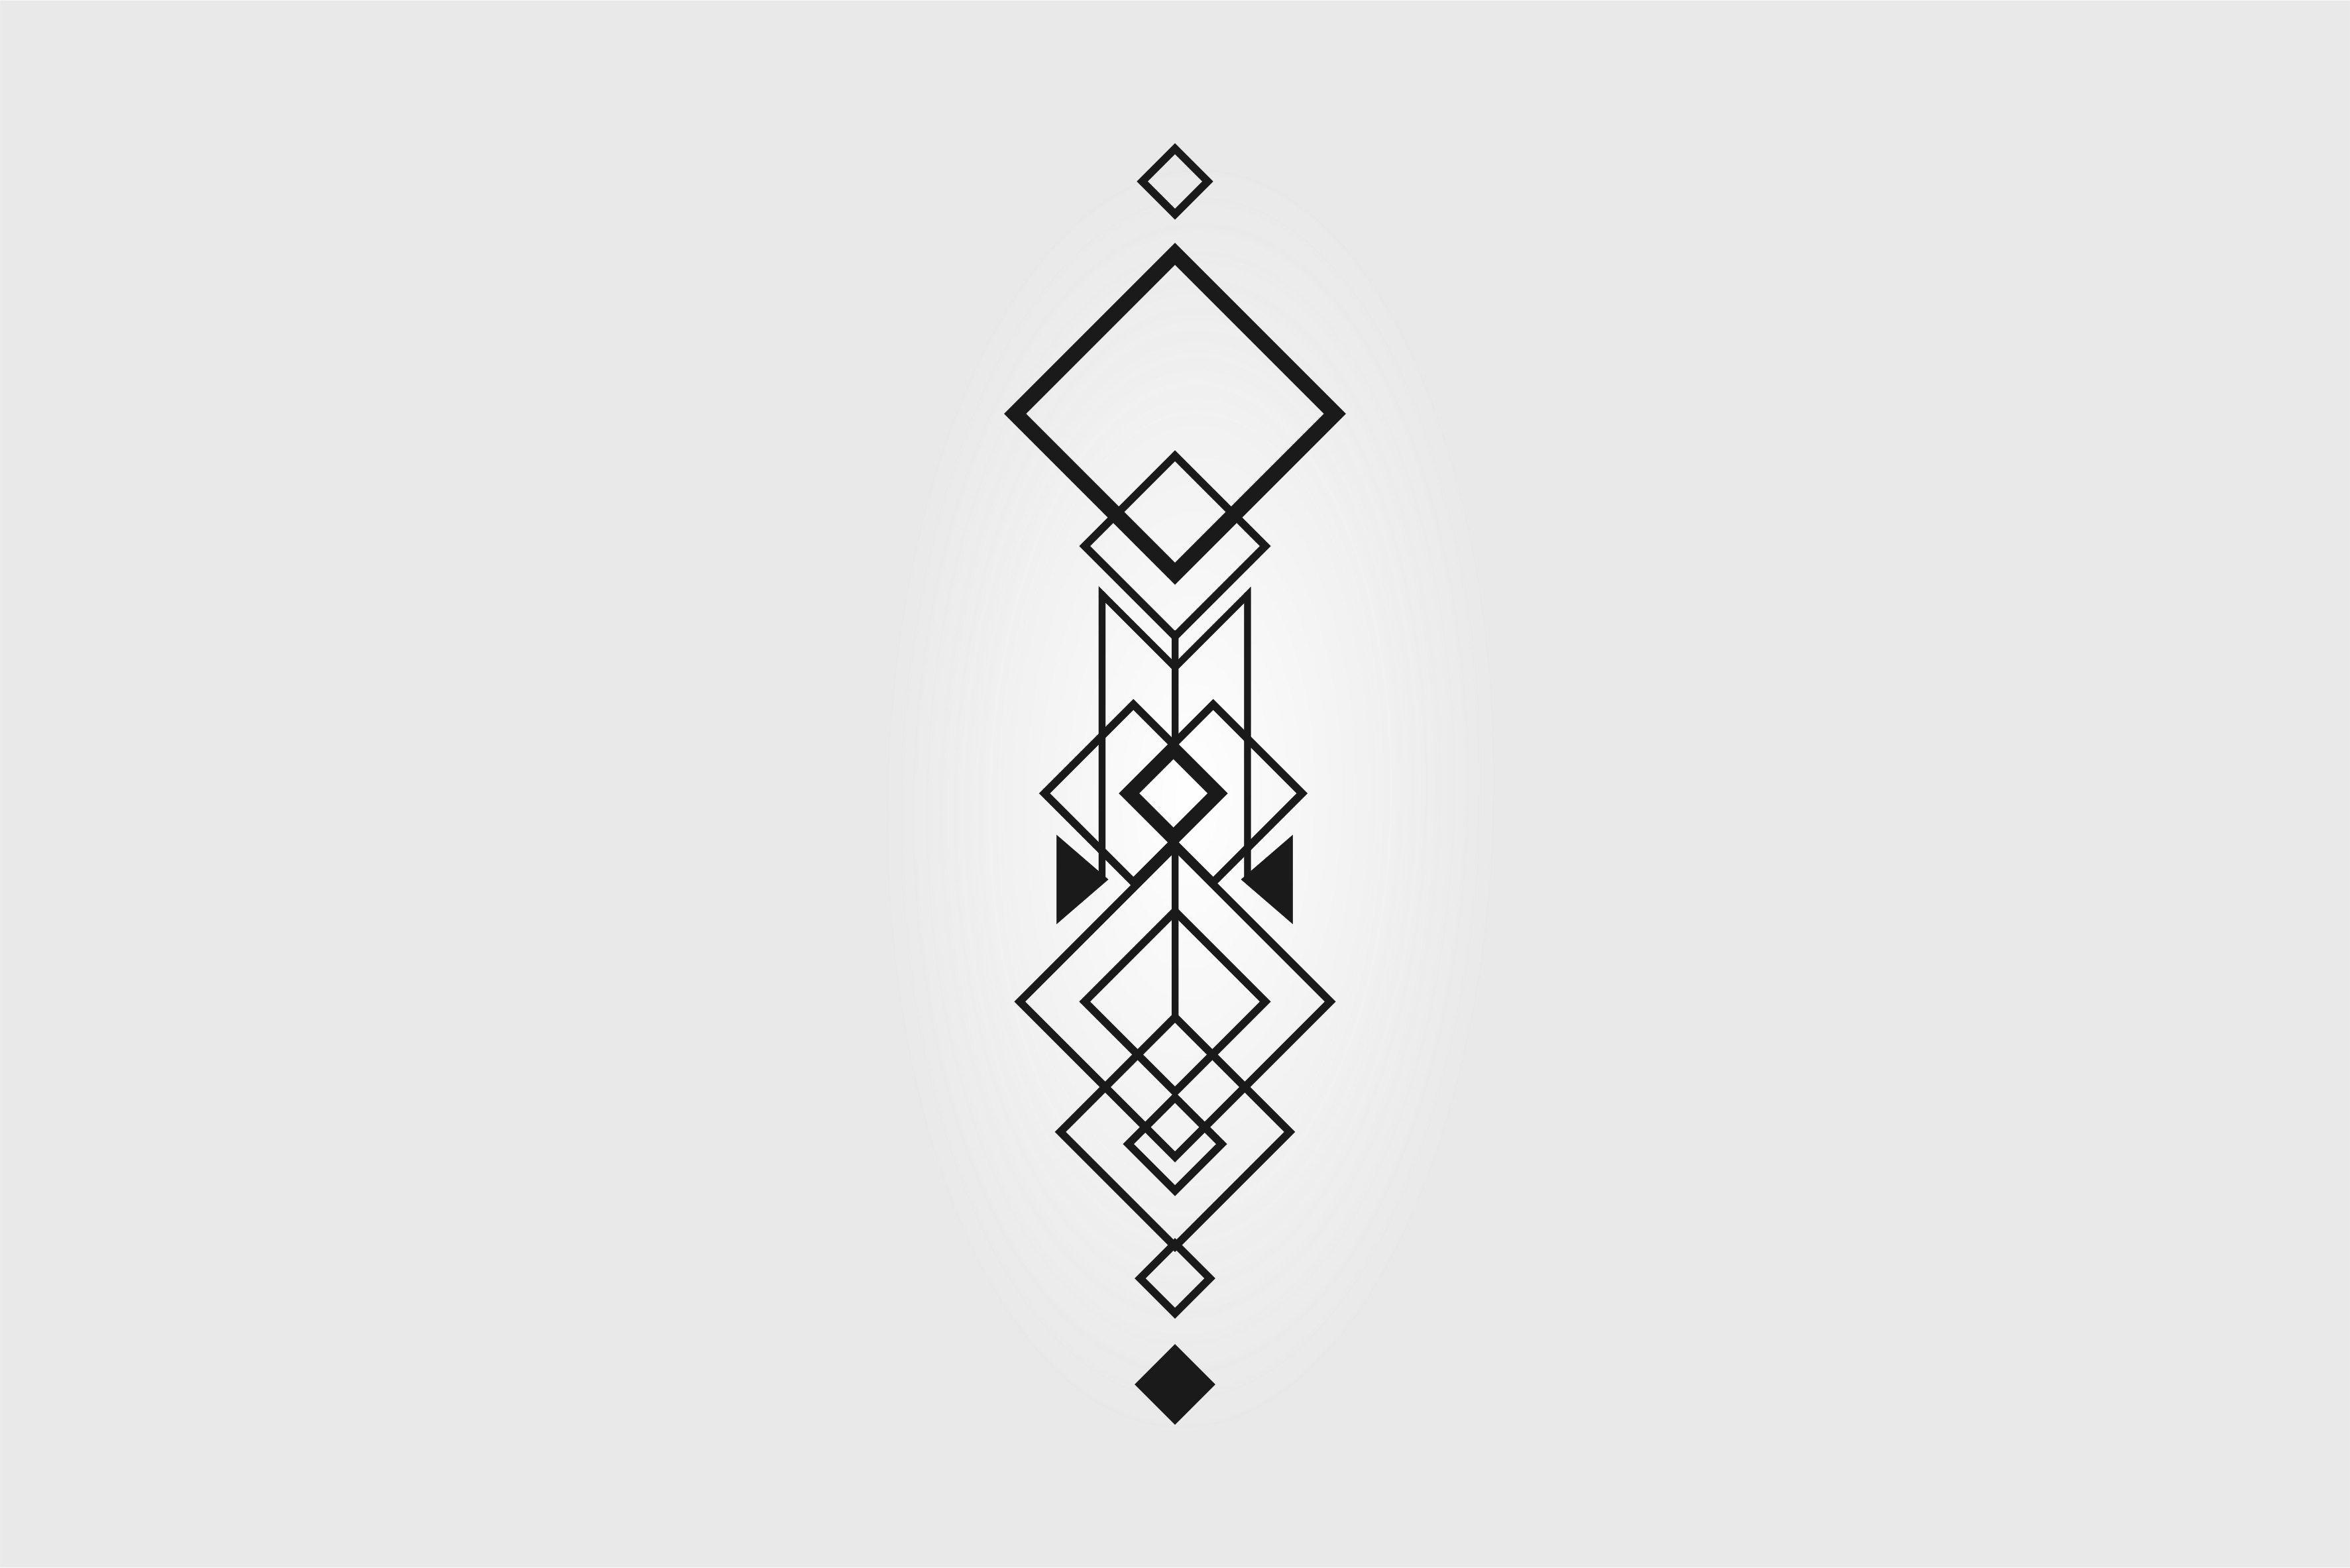 Minimalism Pattern Abstract Lines Geometry Wallpapers: Vector, Abstract, Minimalism, Geometry, Tattoo HD